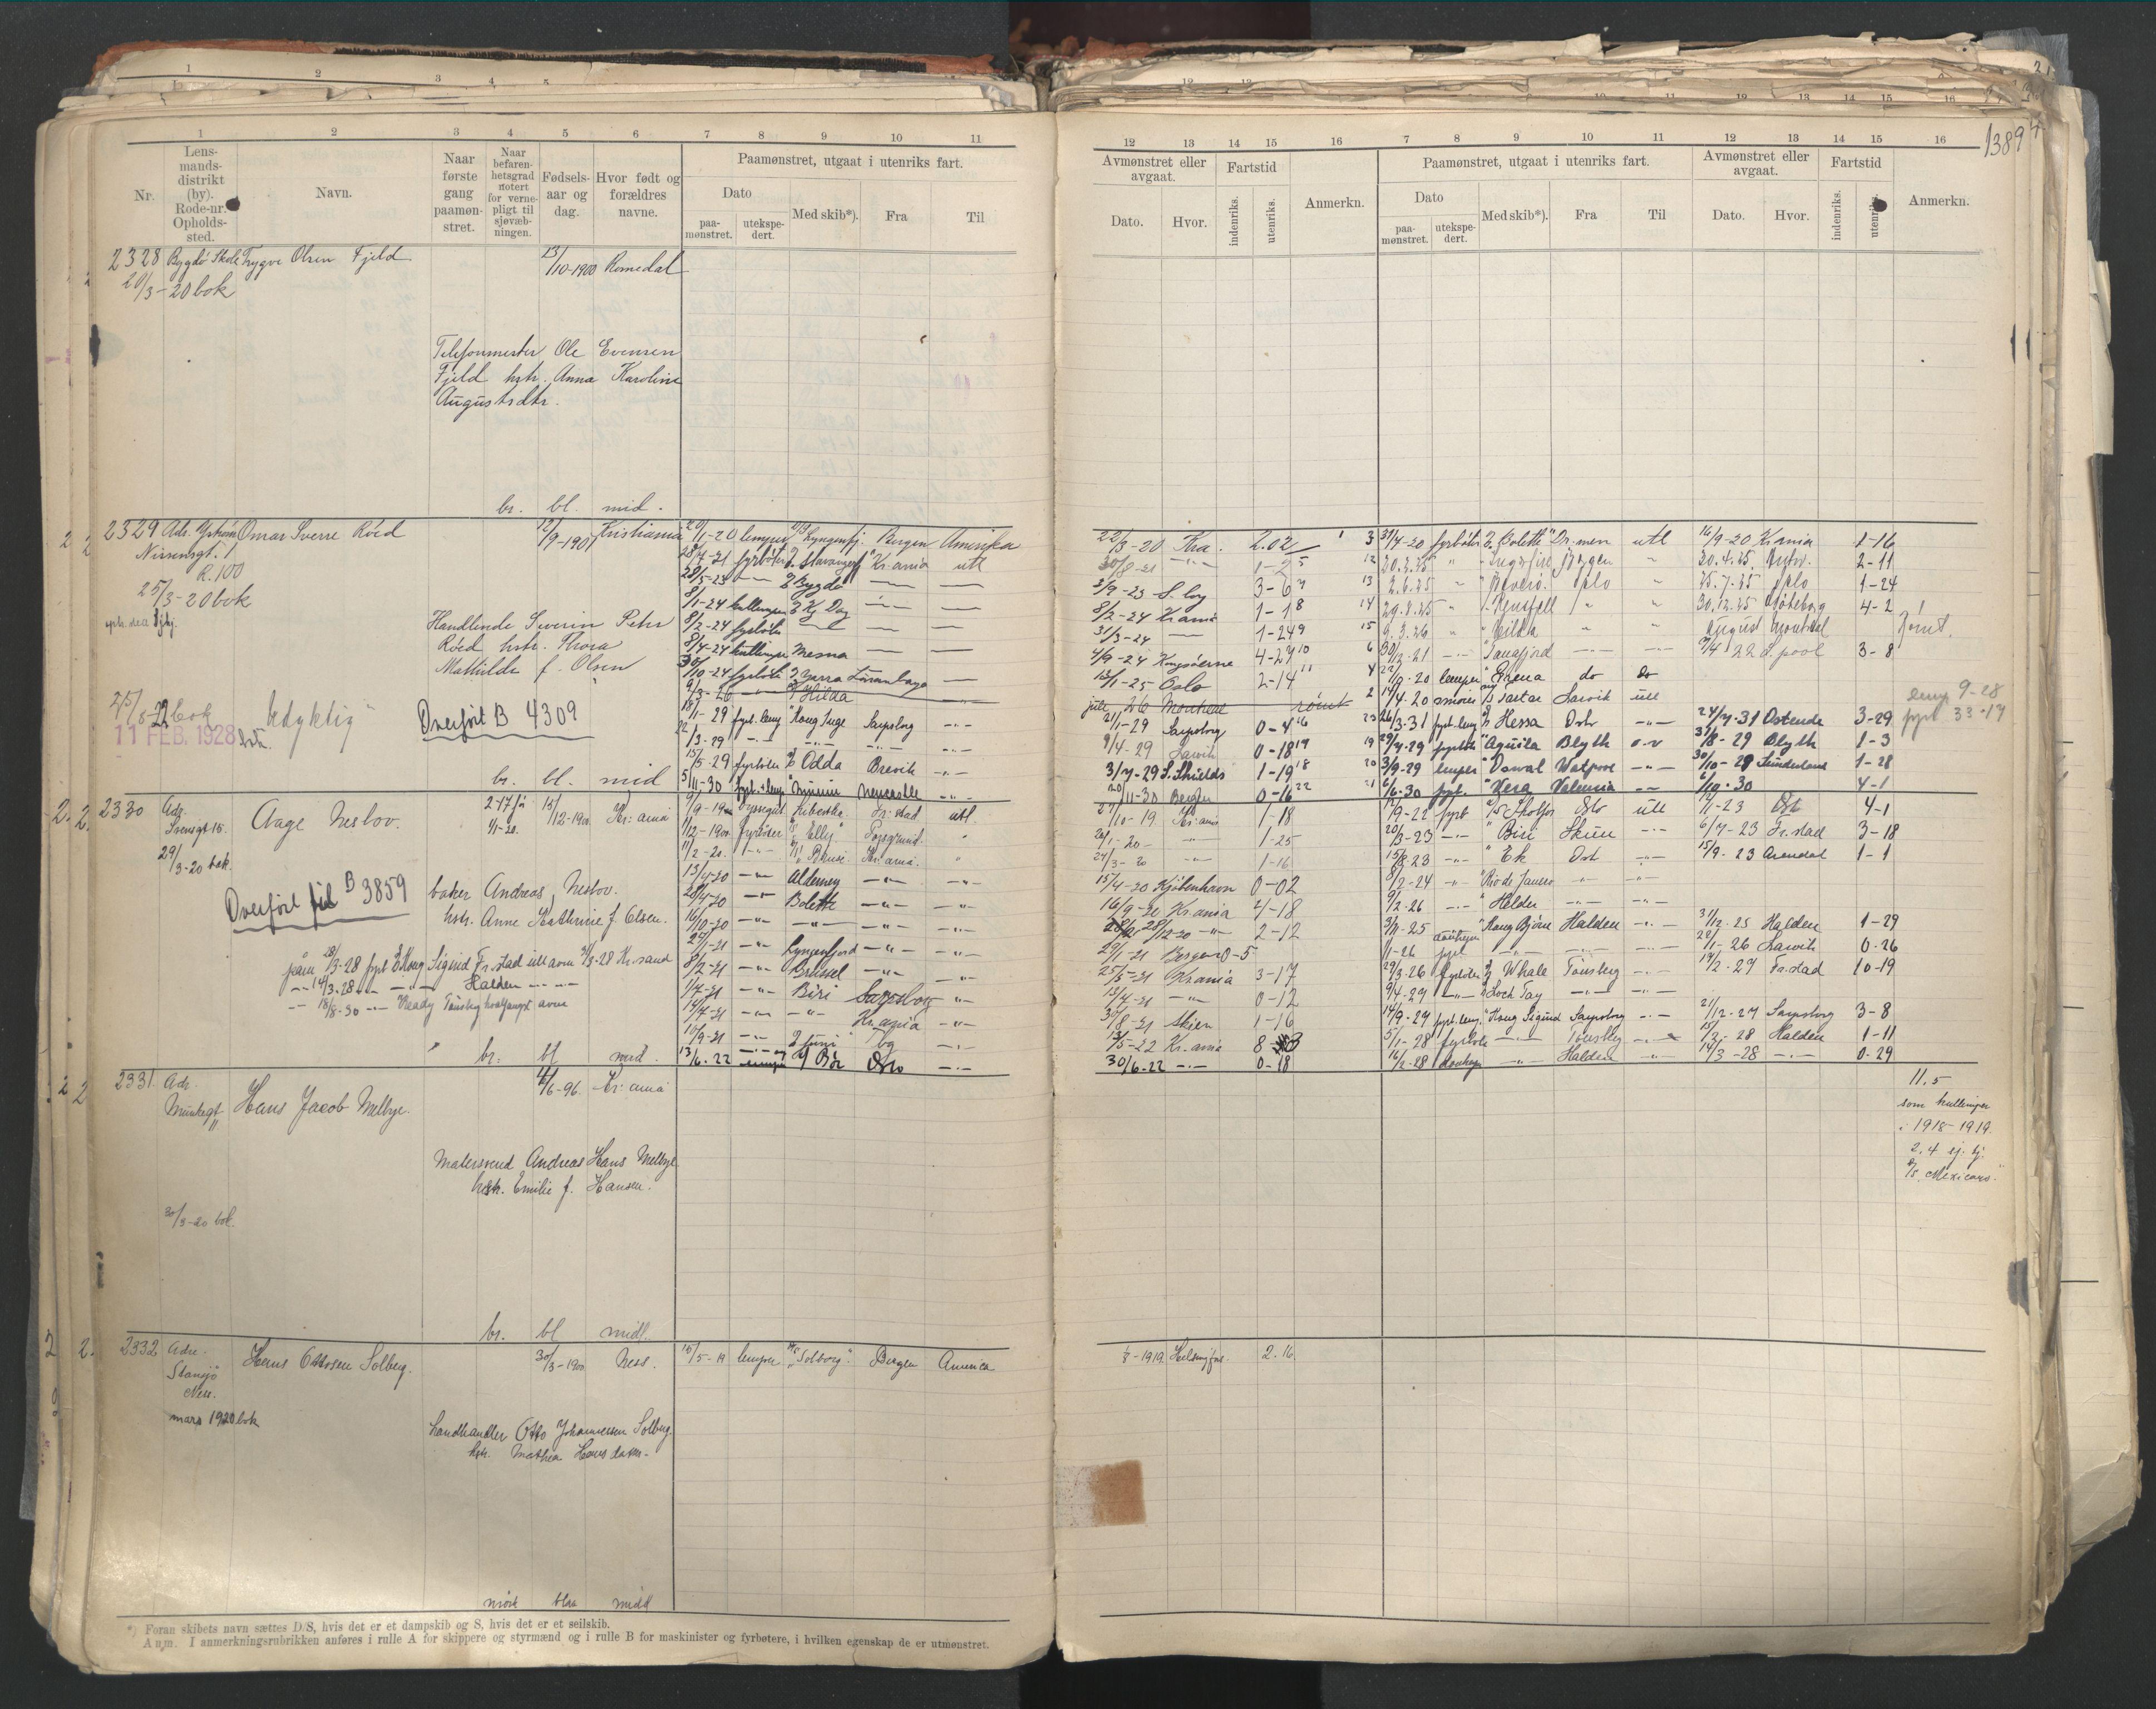 SAO, Oslo sjømannskontor, F/Fd/L0003: B-rulle, 1916, s. 137b-138a